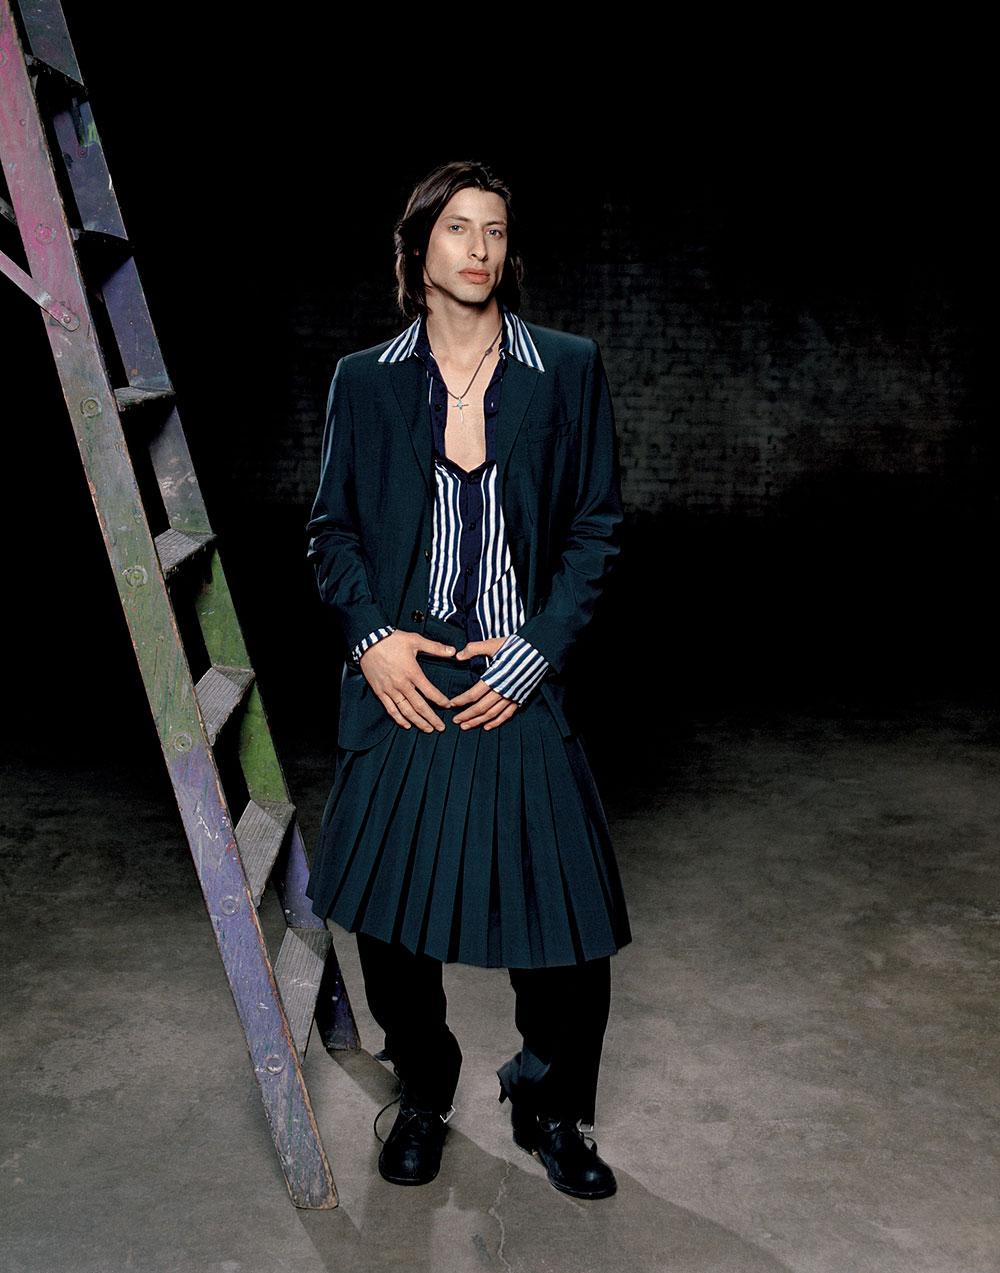 Men-Of-Fashion_45967_8AS.jpg